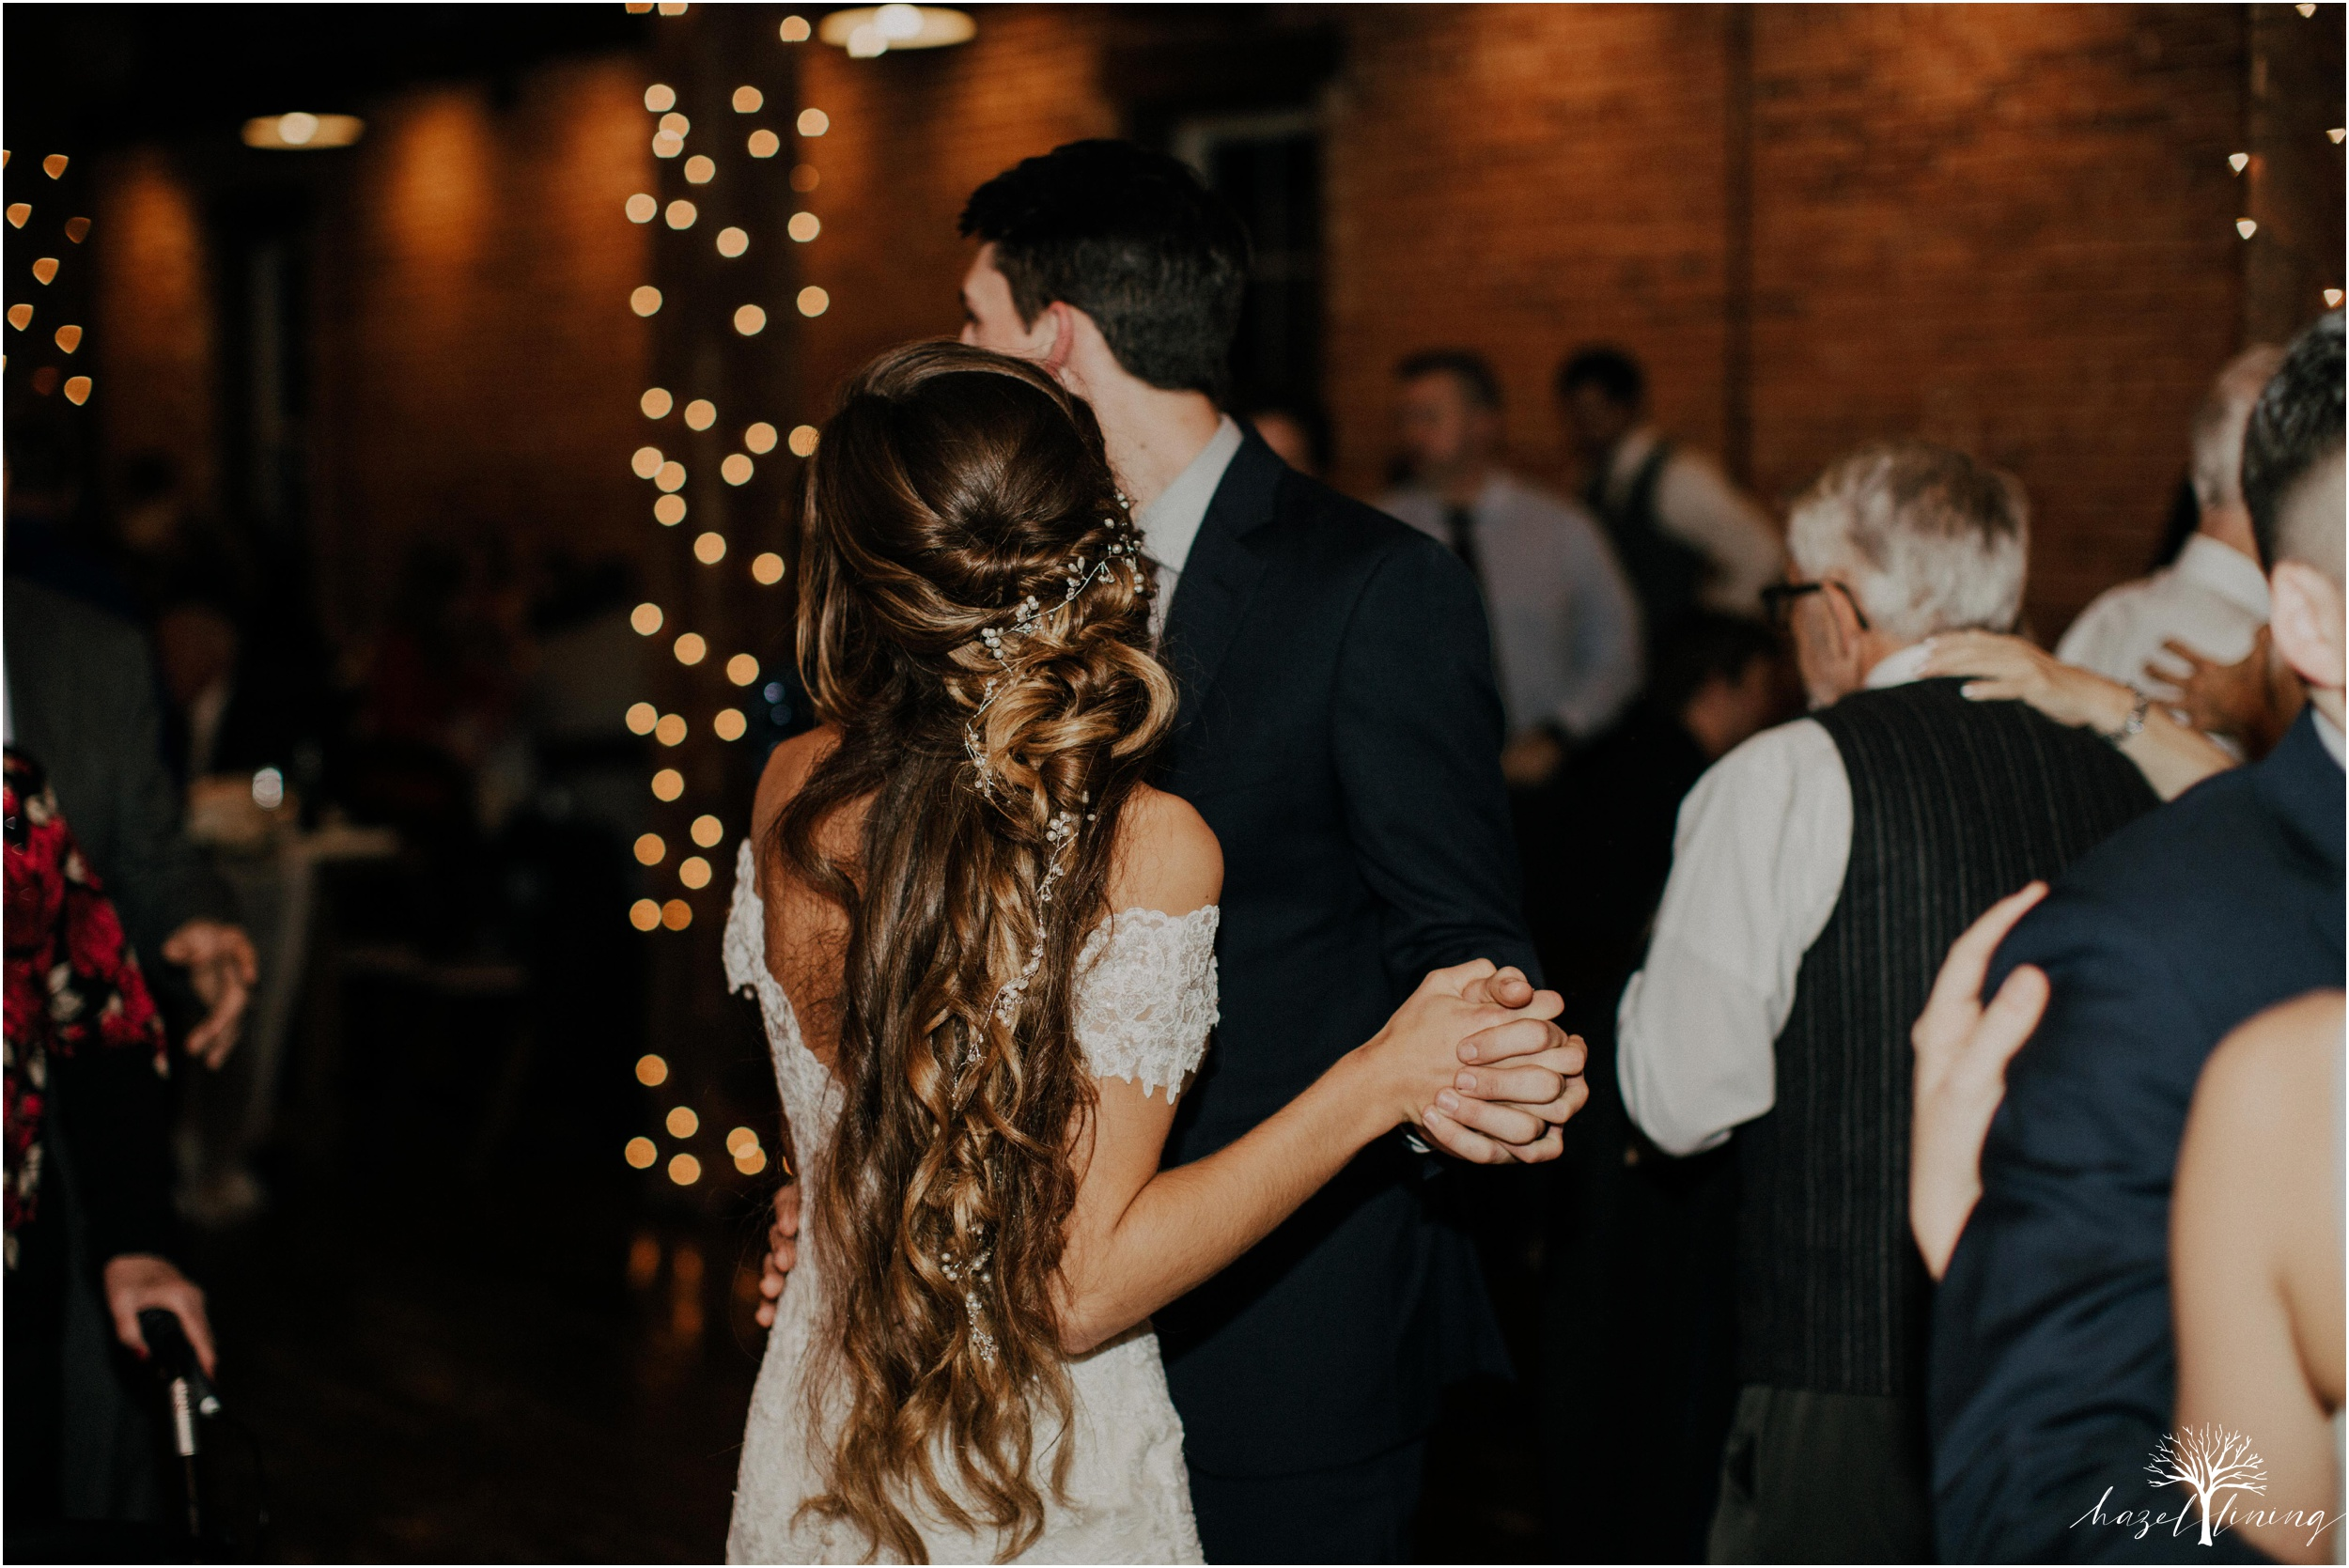 emma-matt-gehringer-the-booking-house-lancaster-manhiem-pennsylvania-winter-wedding_0172.jpg